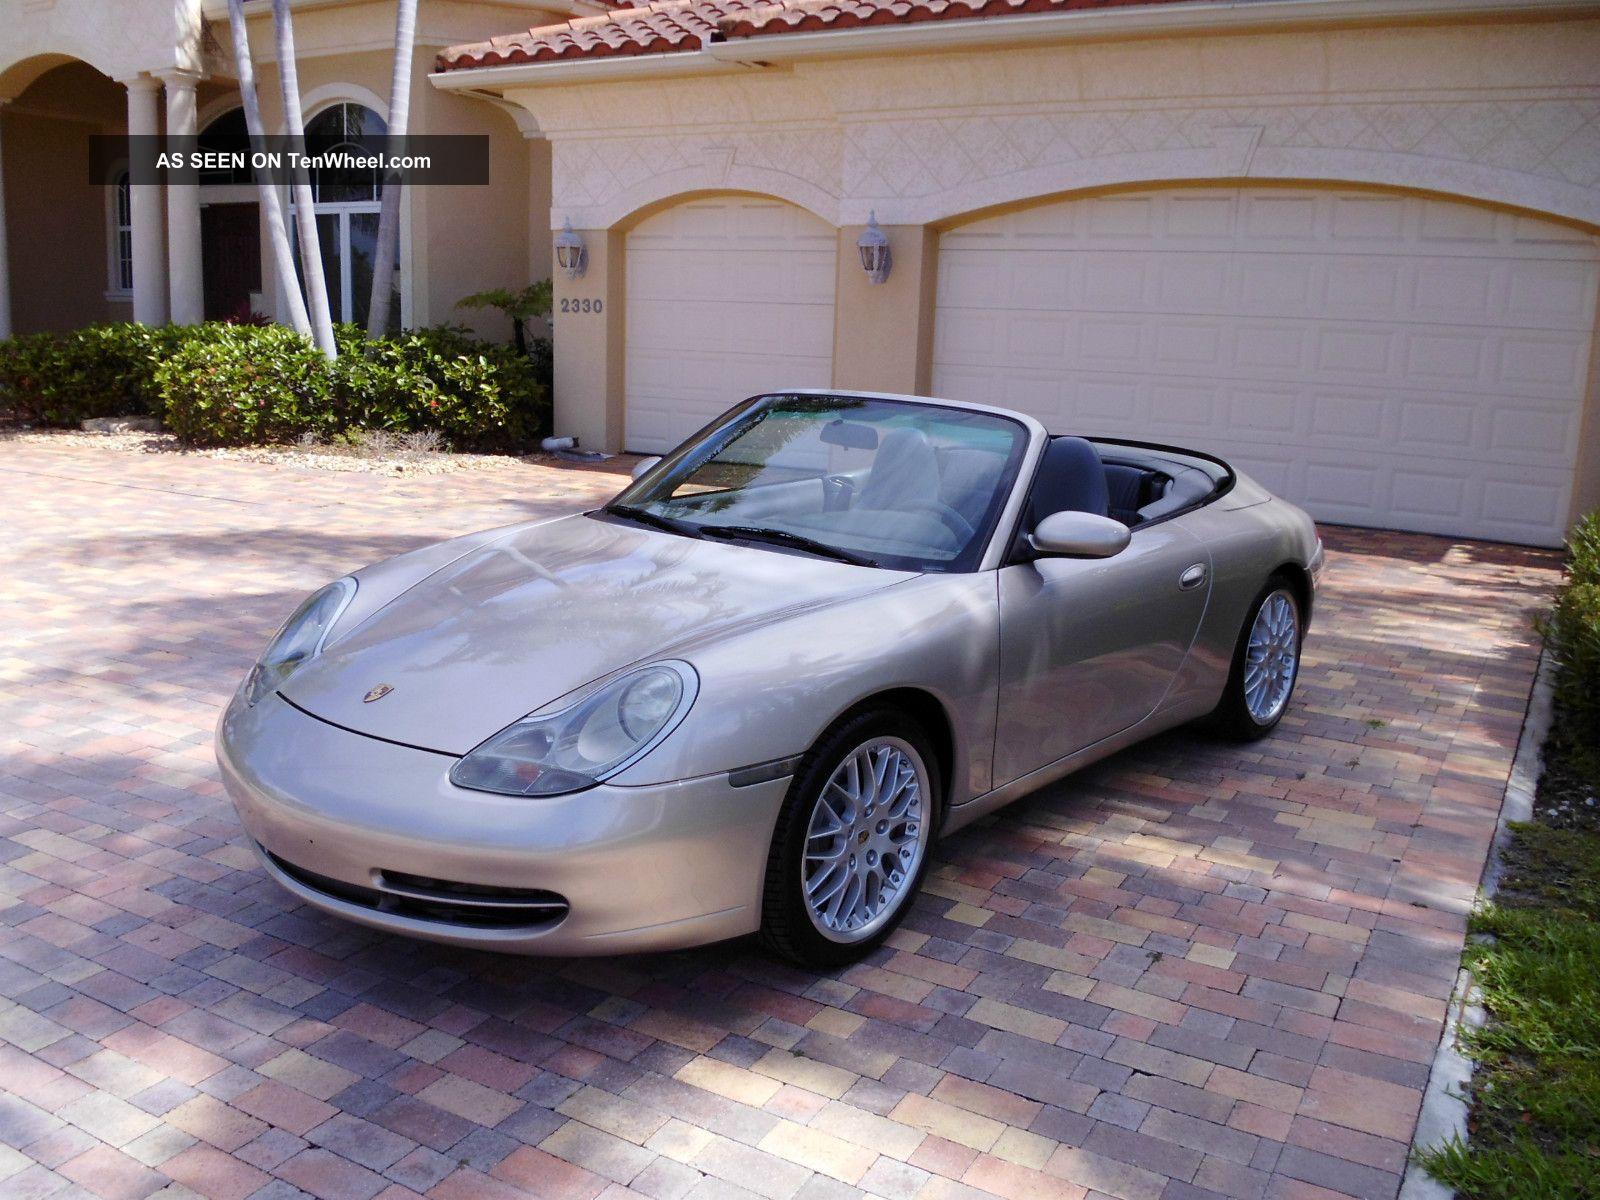 2000 porsche carrera 911 996 cabriolet convertible 64 000. Black Bedroom Furniture Sets. Home Design Ideas